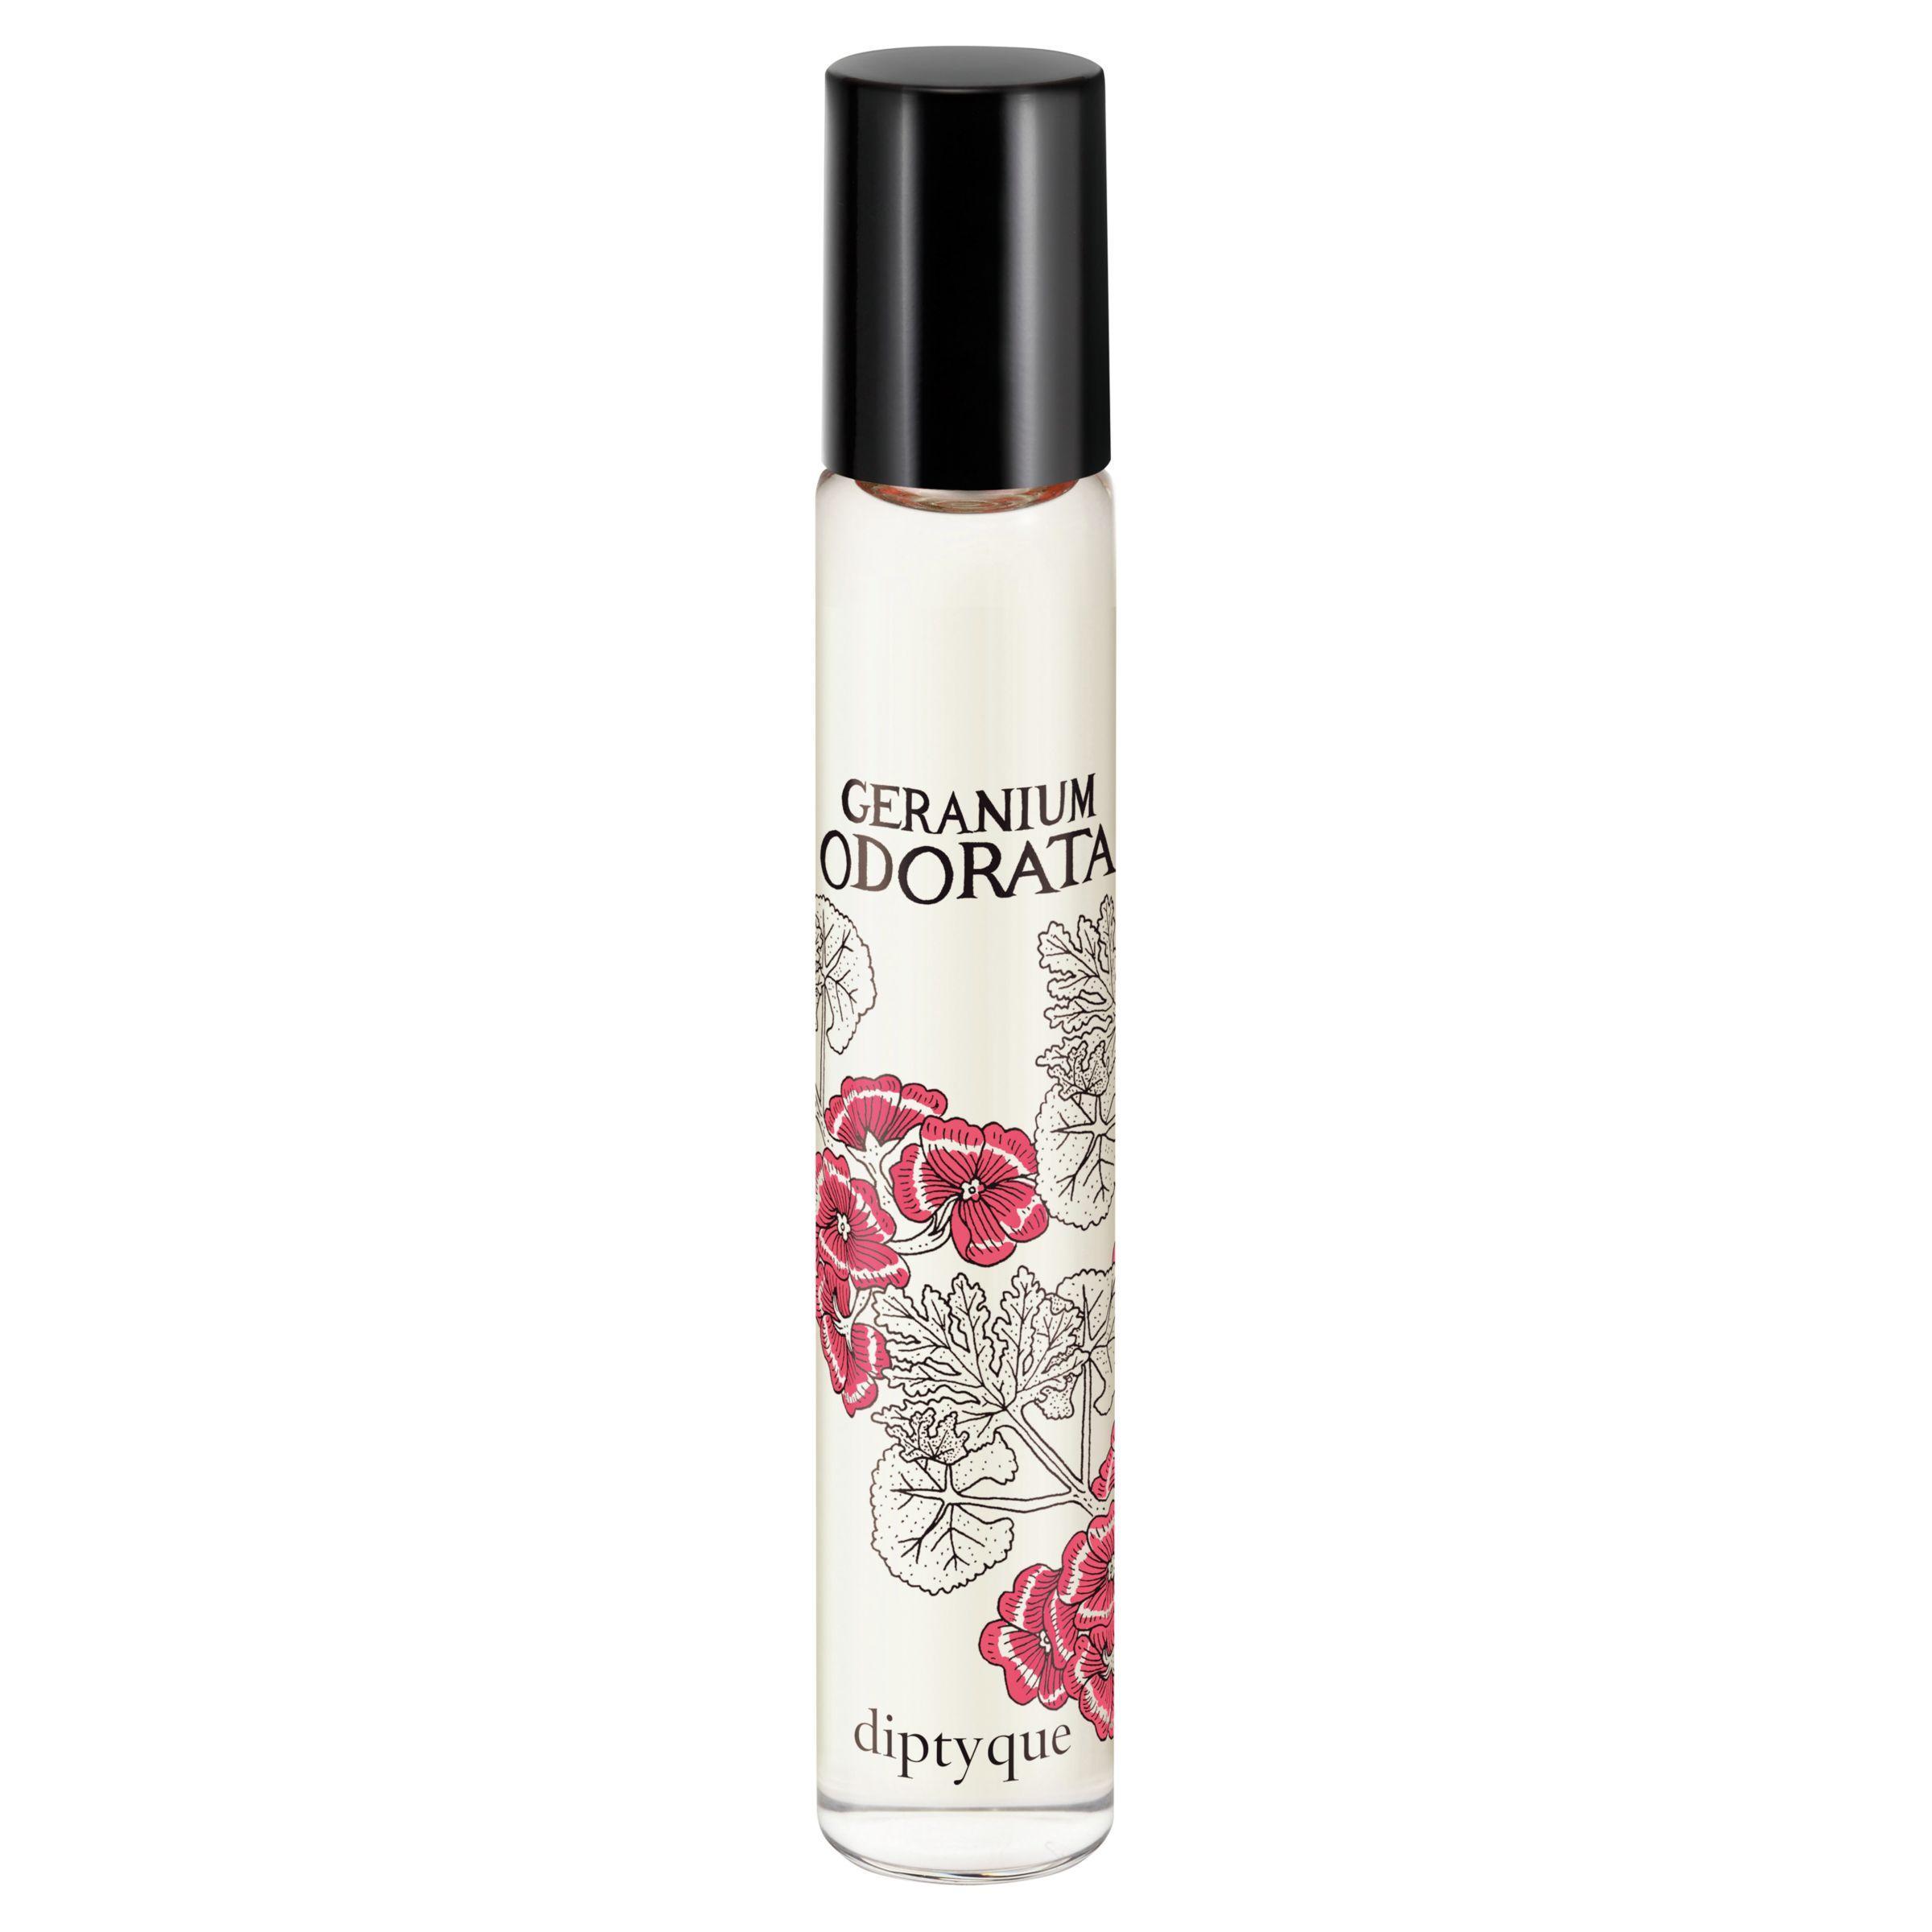 Diptyque Diptyque Geranium Odorata Roll-On Perfume, 20ml